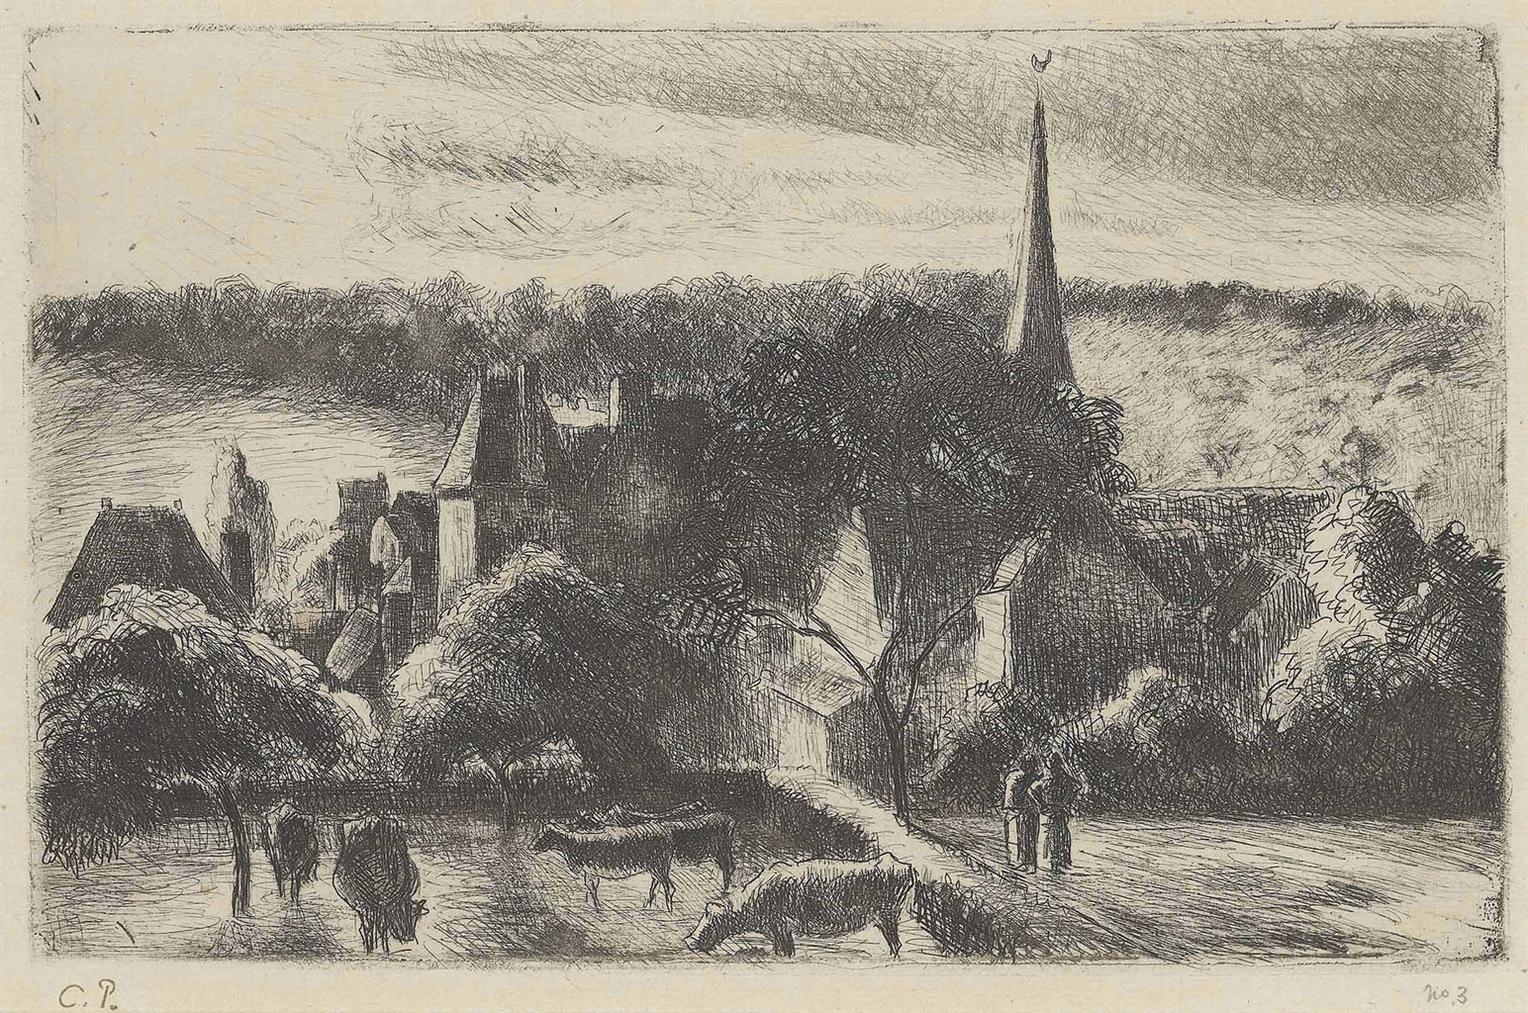 Camille Pissarro-Eglise Et Ferme D'Eragny-1890